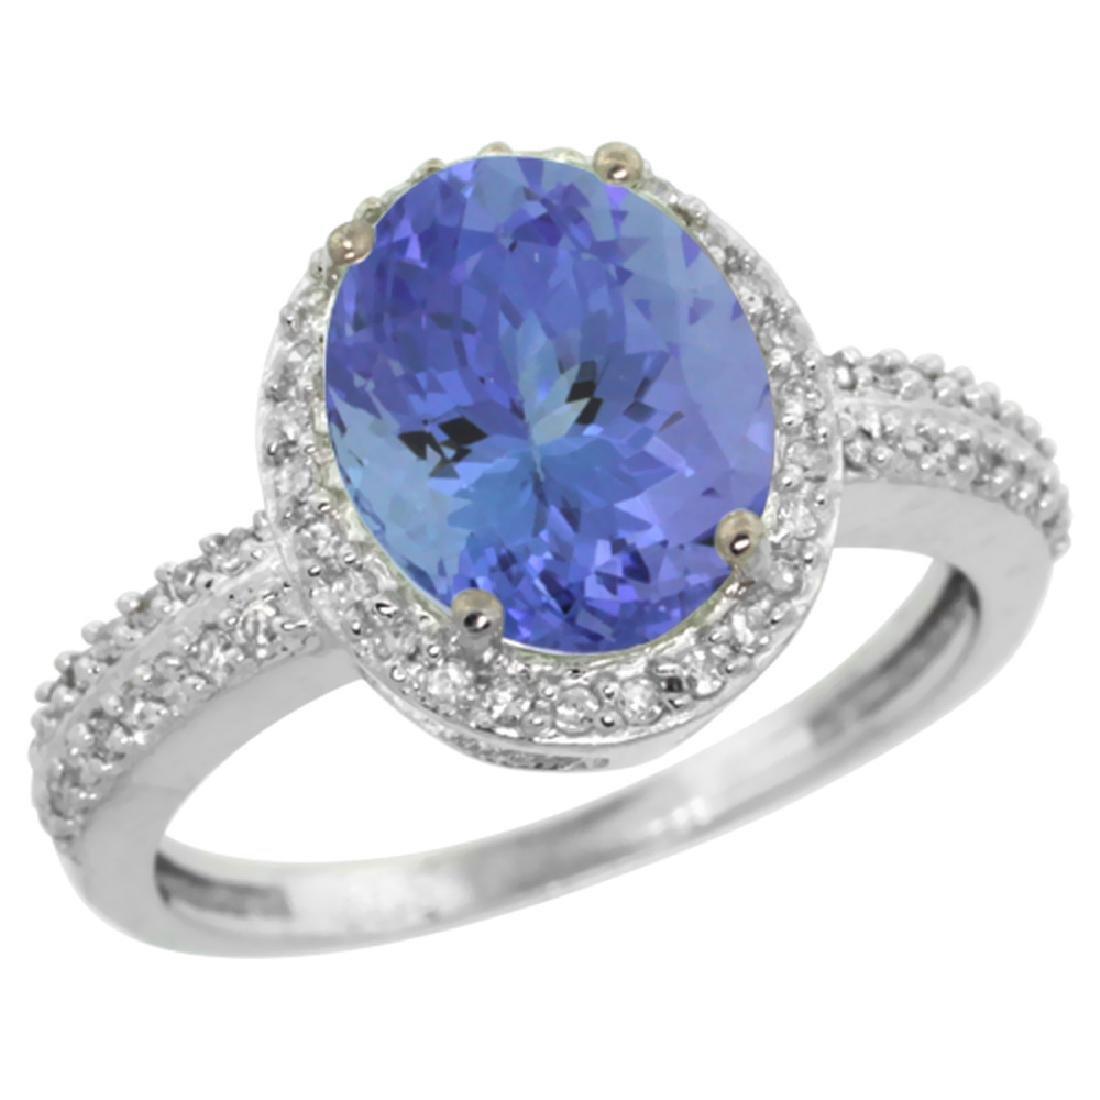 Natural 2.56 ctw Tanzanite & Diamond Engagement Ring